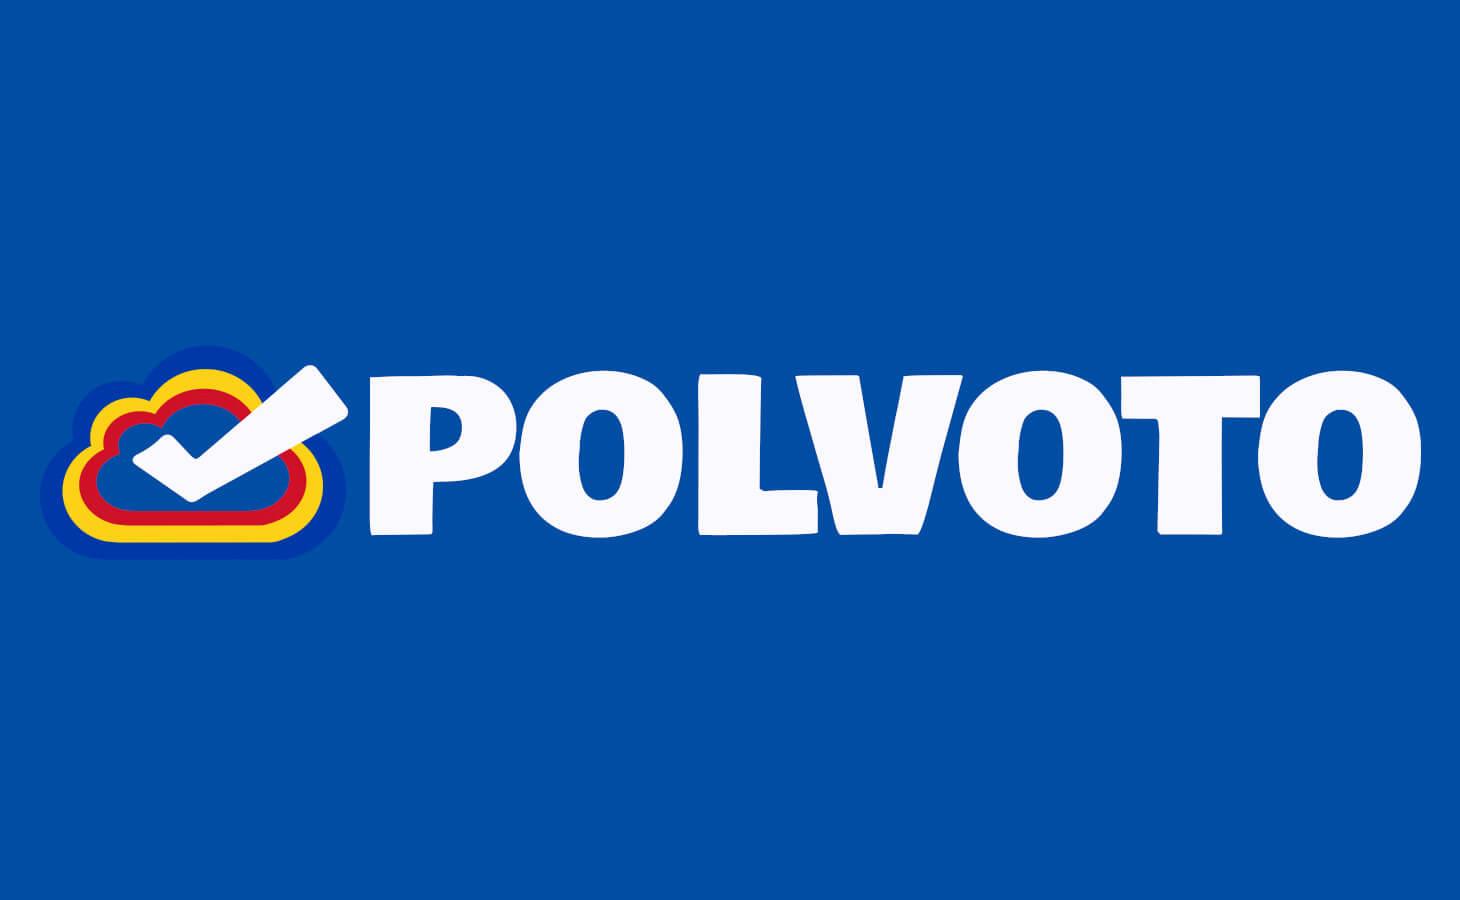 POLVOTO Web Services